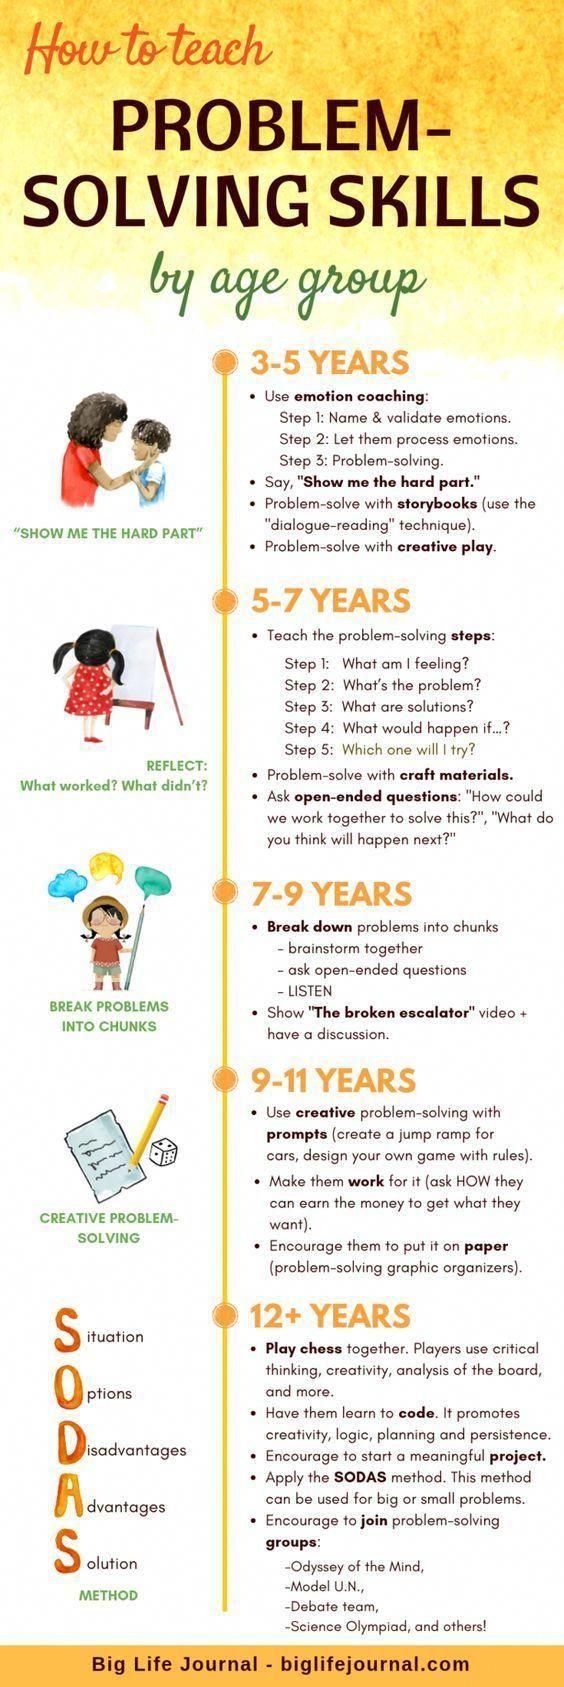 Self Esteem Confidence Kit Pdf Ages 5 11 Parenting Skills Parenting Problem Solving Skills